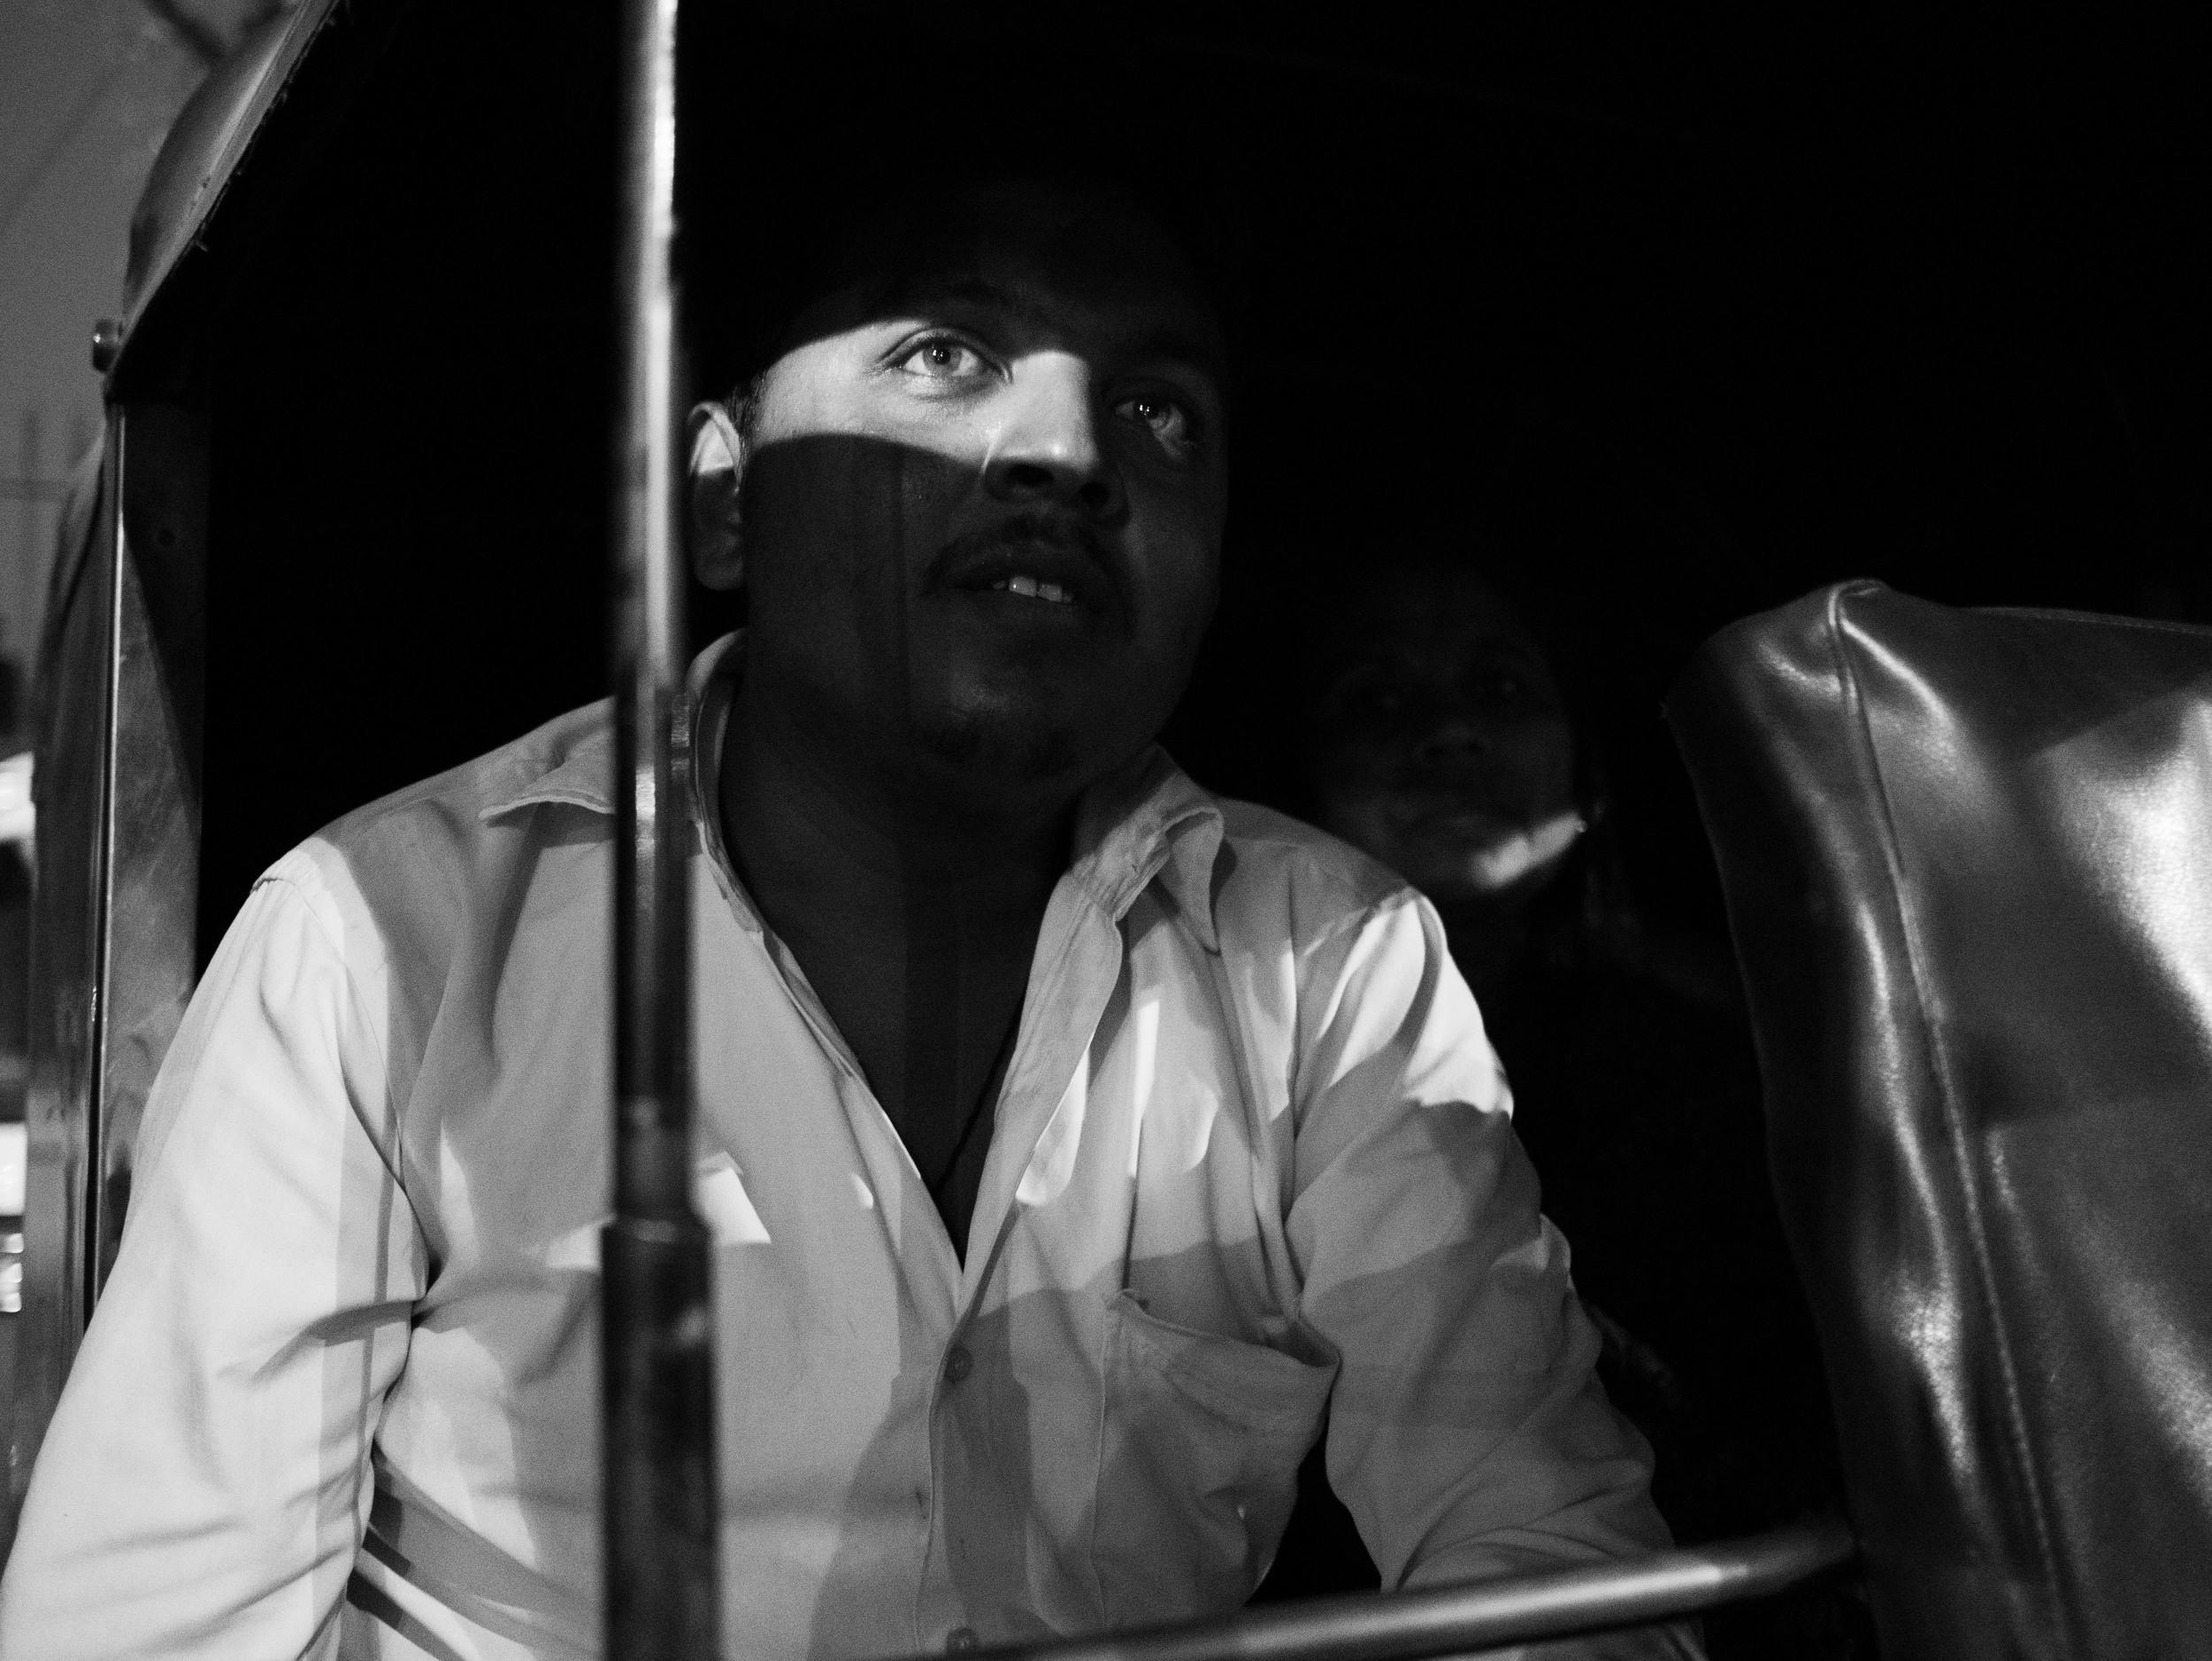 A passenger waiting in autorickshaw, part of the street photography series captured in Vadodara, Gujarat in India by Gagan Sadana.